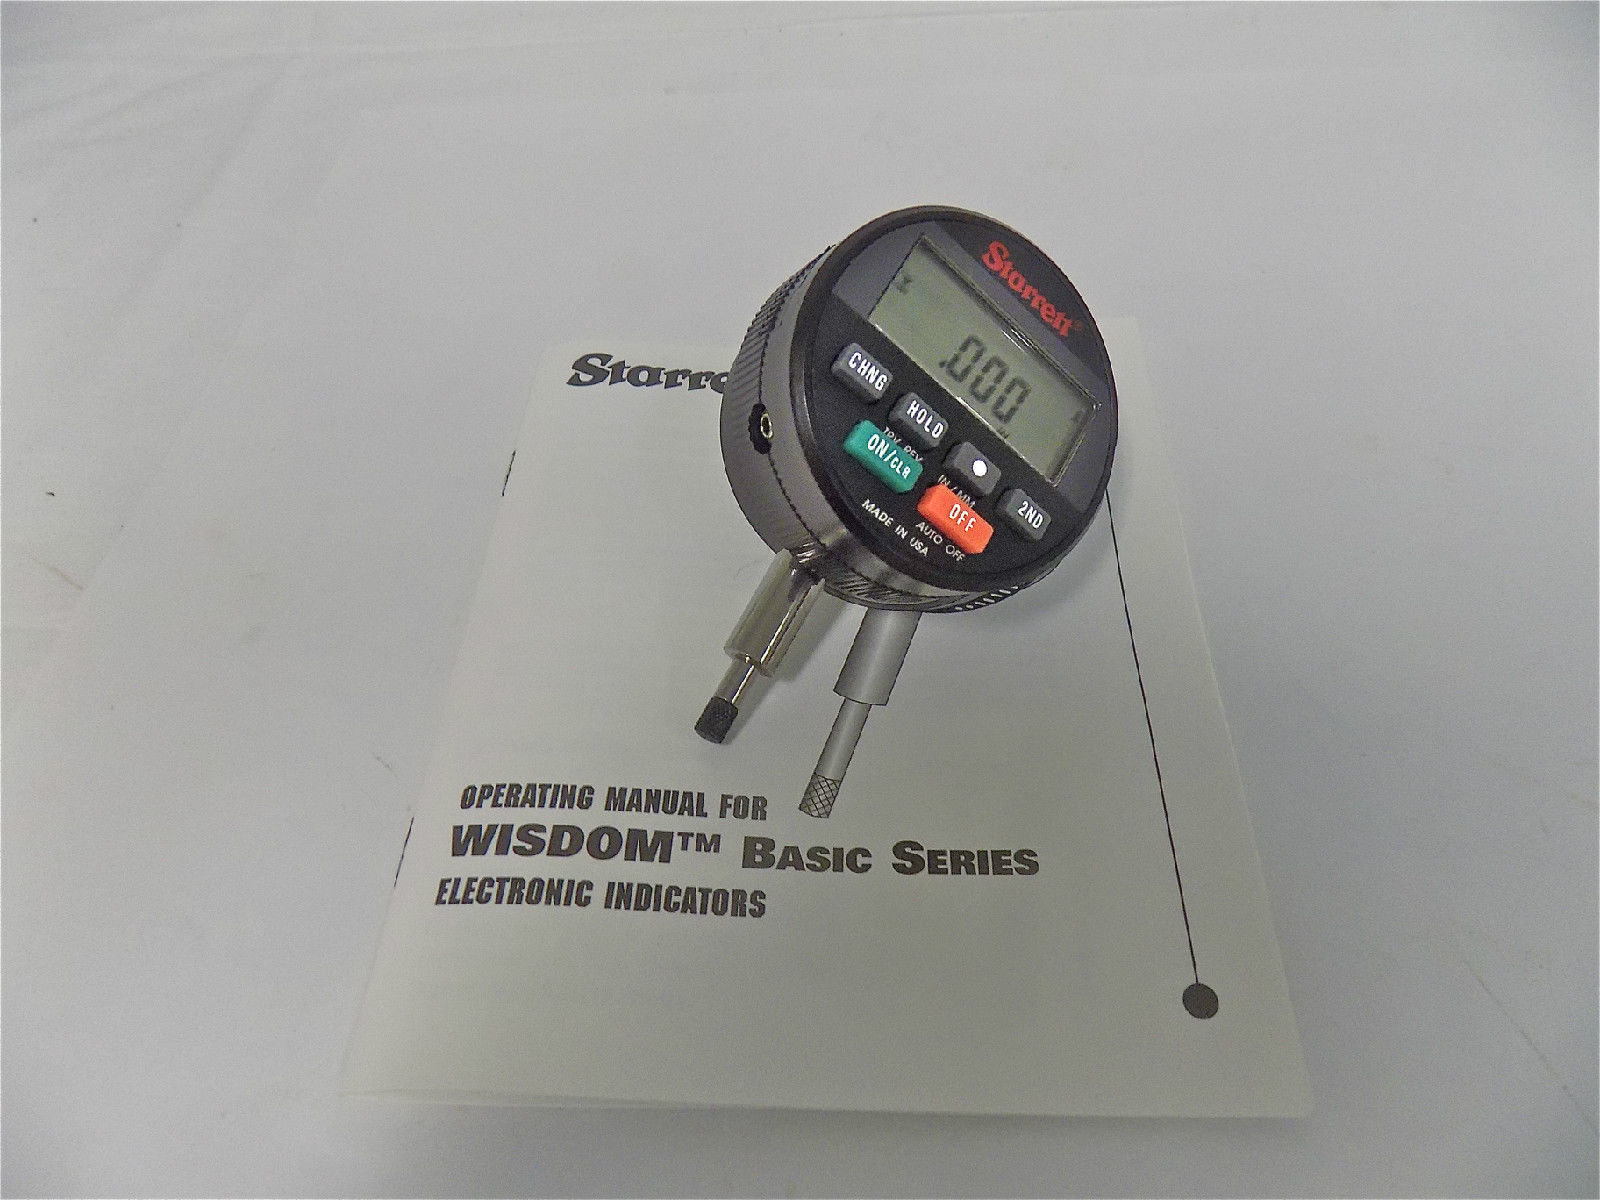 Electronic Drop Indicators : Starrett quot mm wisdom basic electronic drop